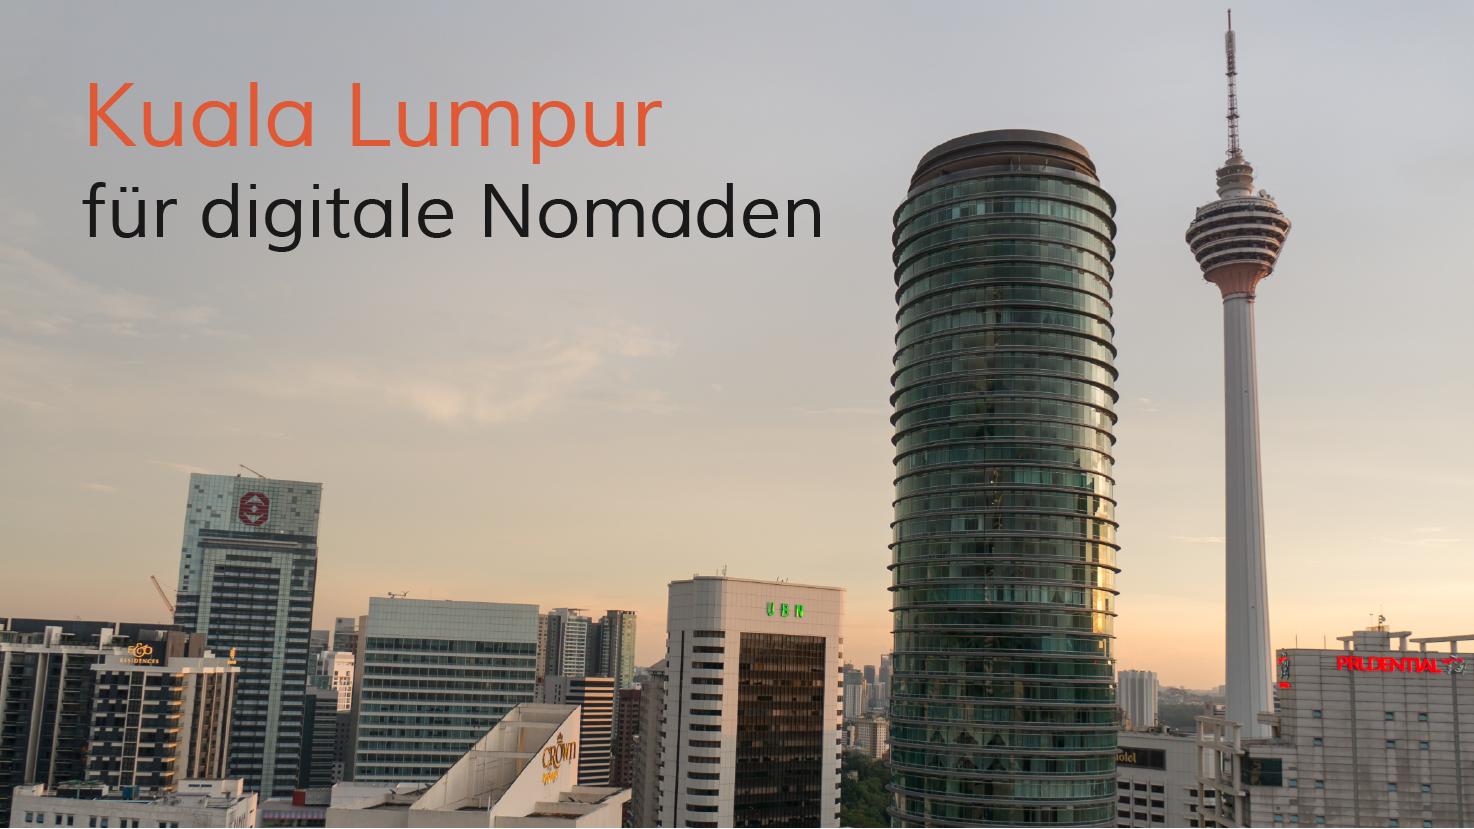 Kuala Lumpur für digitale Nomaden